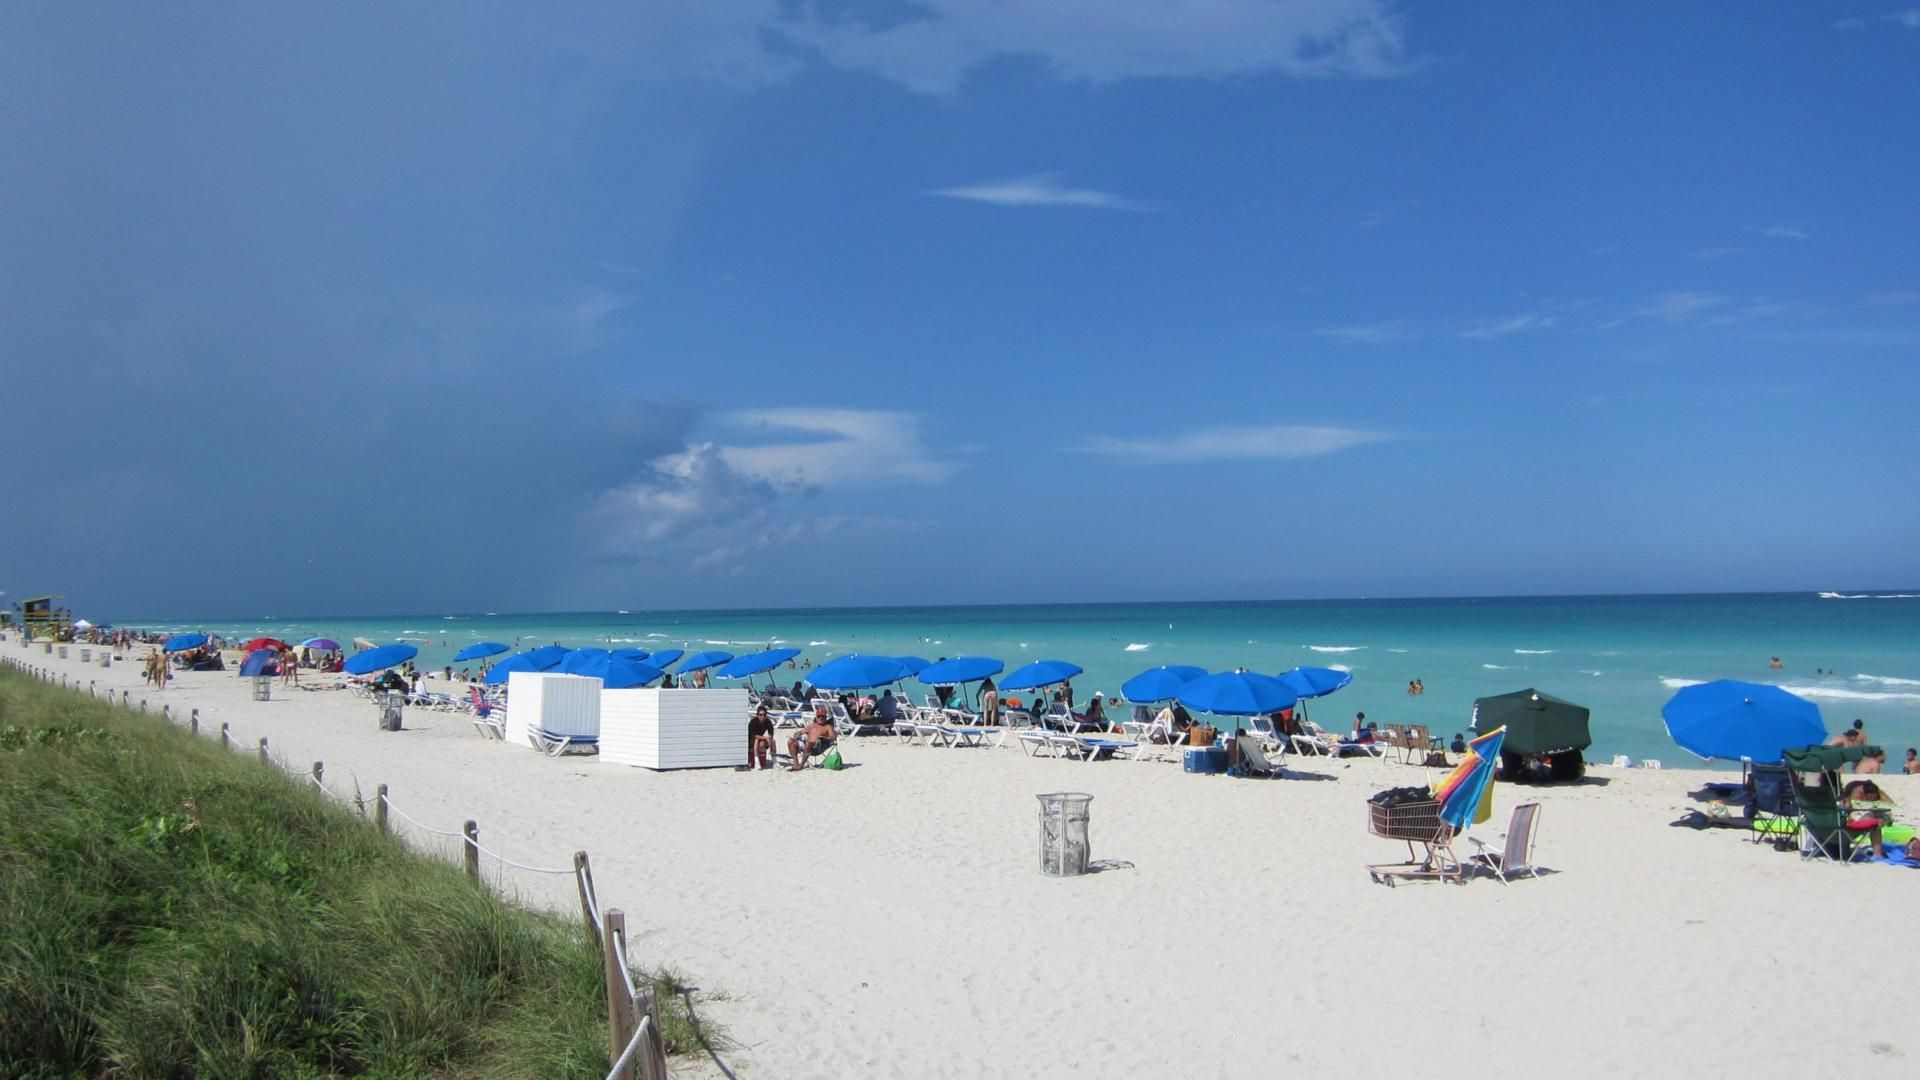 South Beach Miami Florida Hd Wallpaper Clearwater